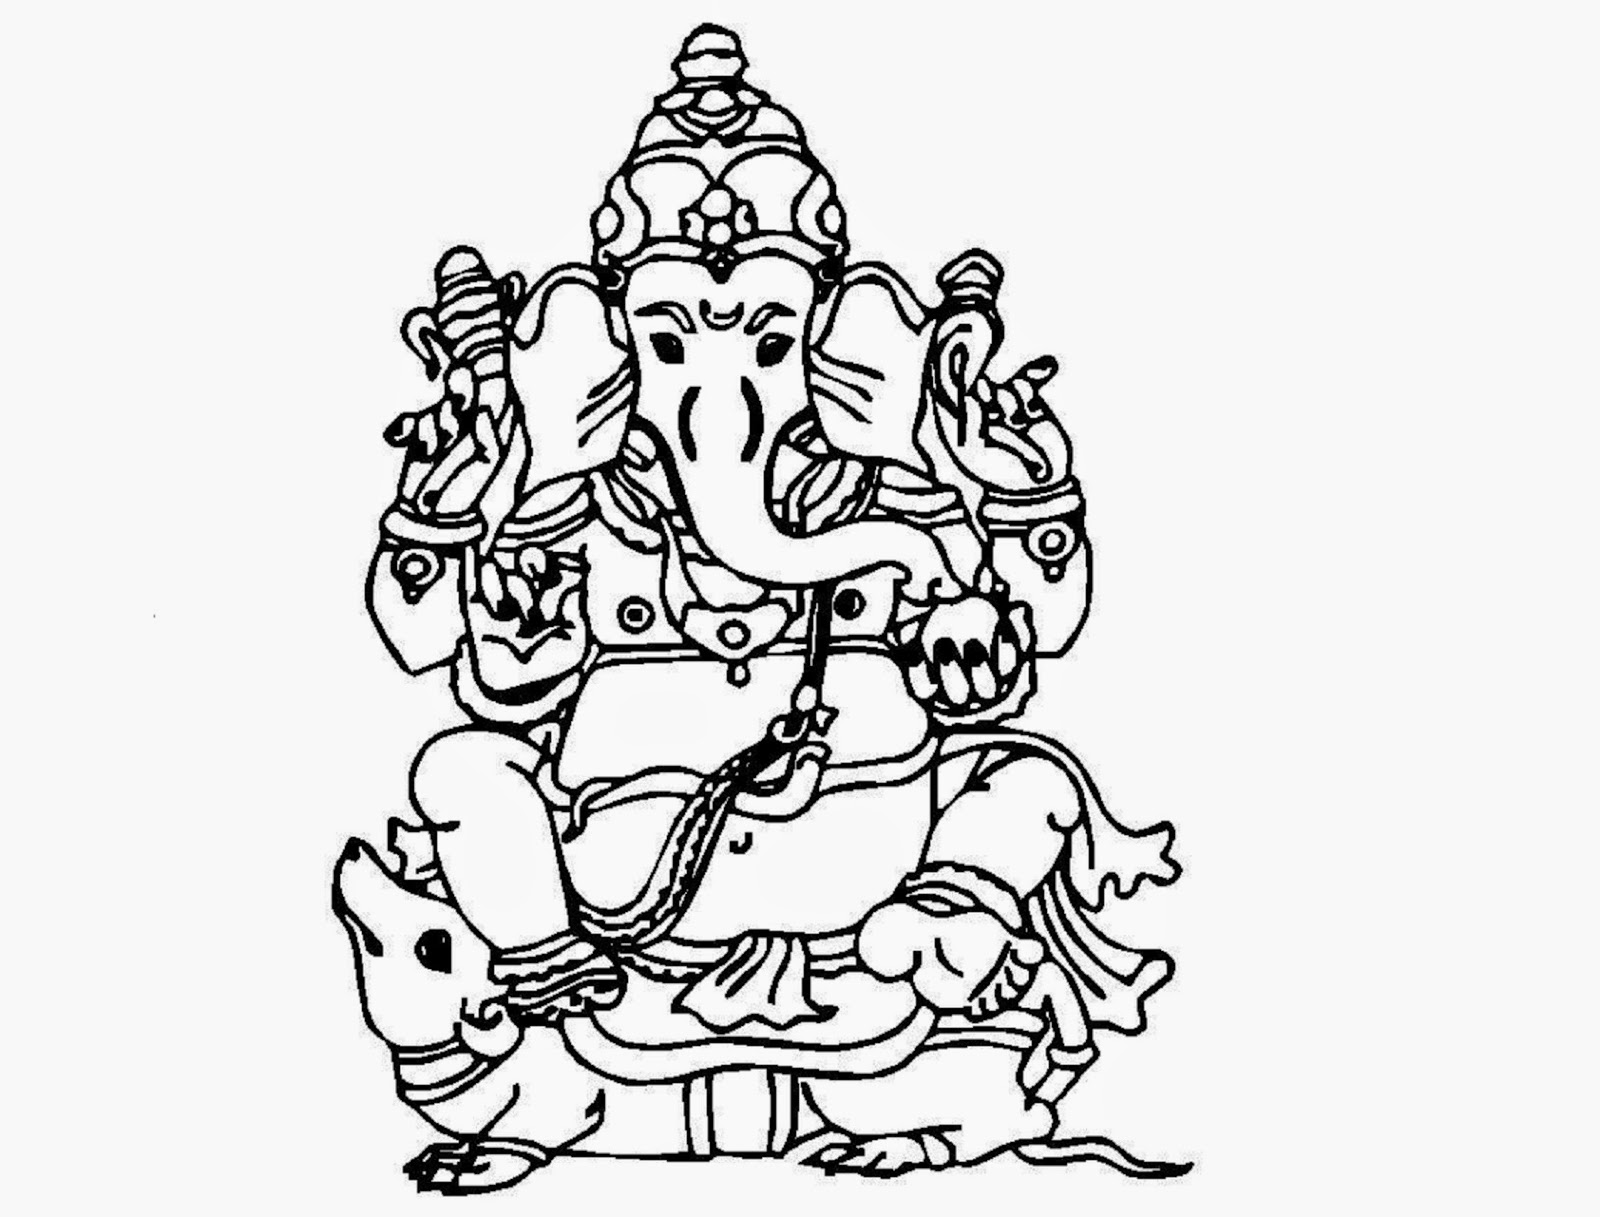 Colour drawing free hd wallpapers lord ganesha coloring for Ganesha coloring pages